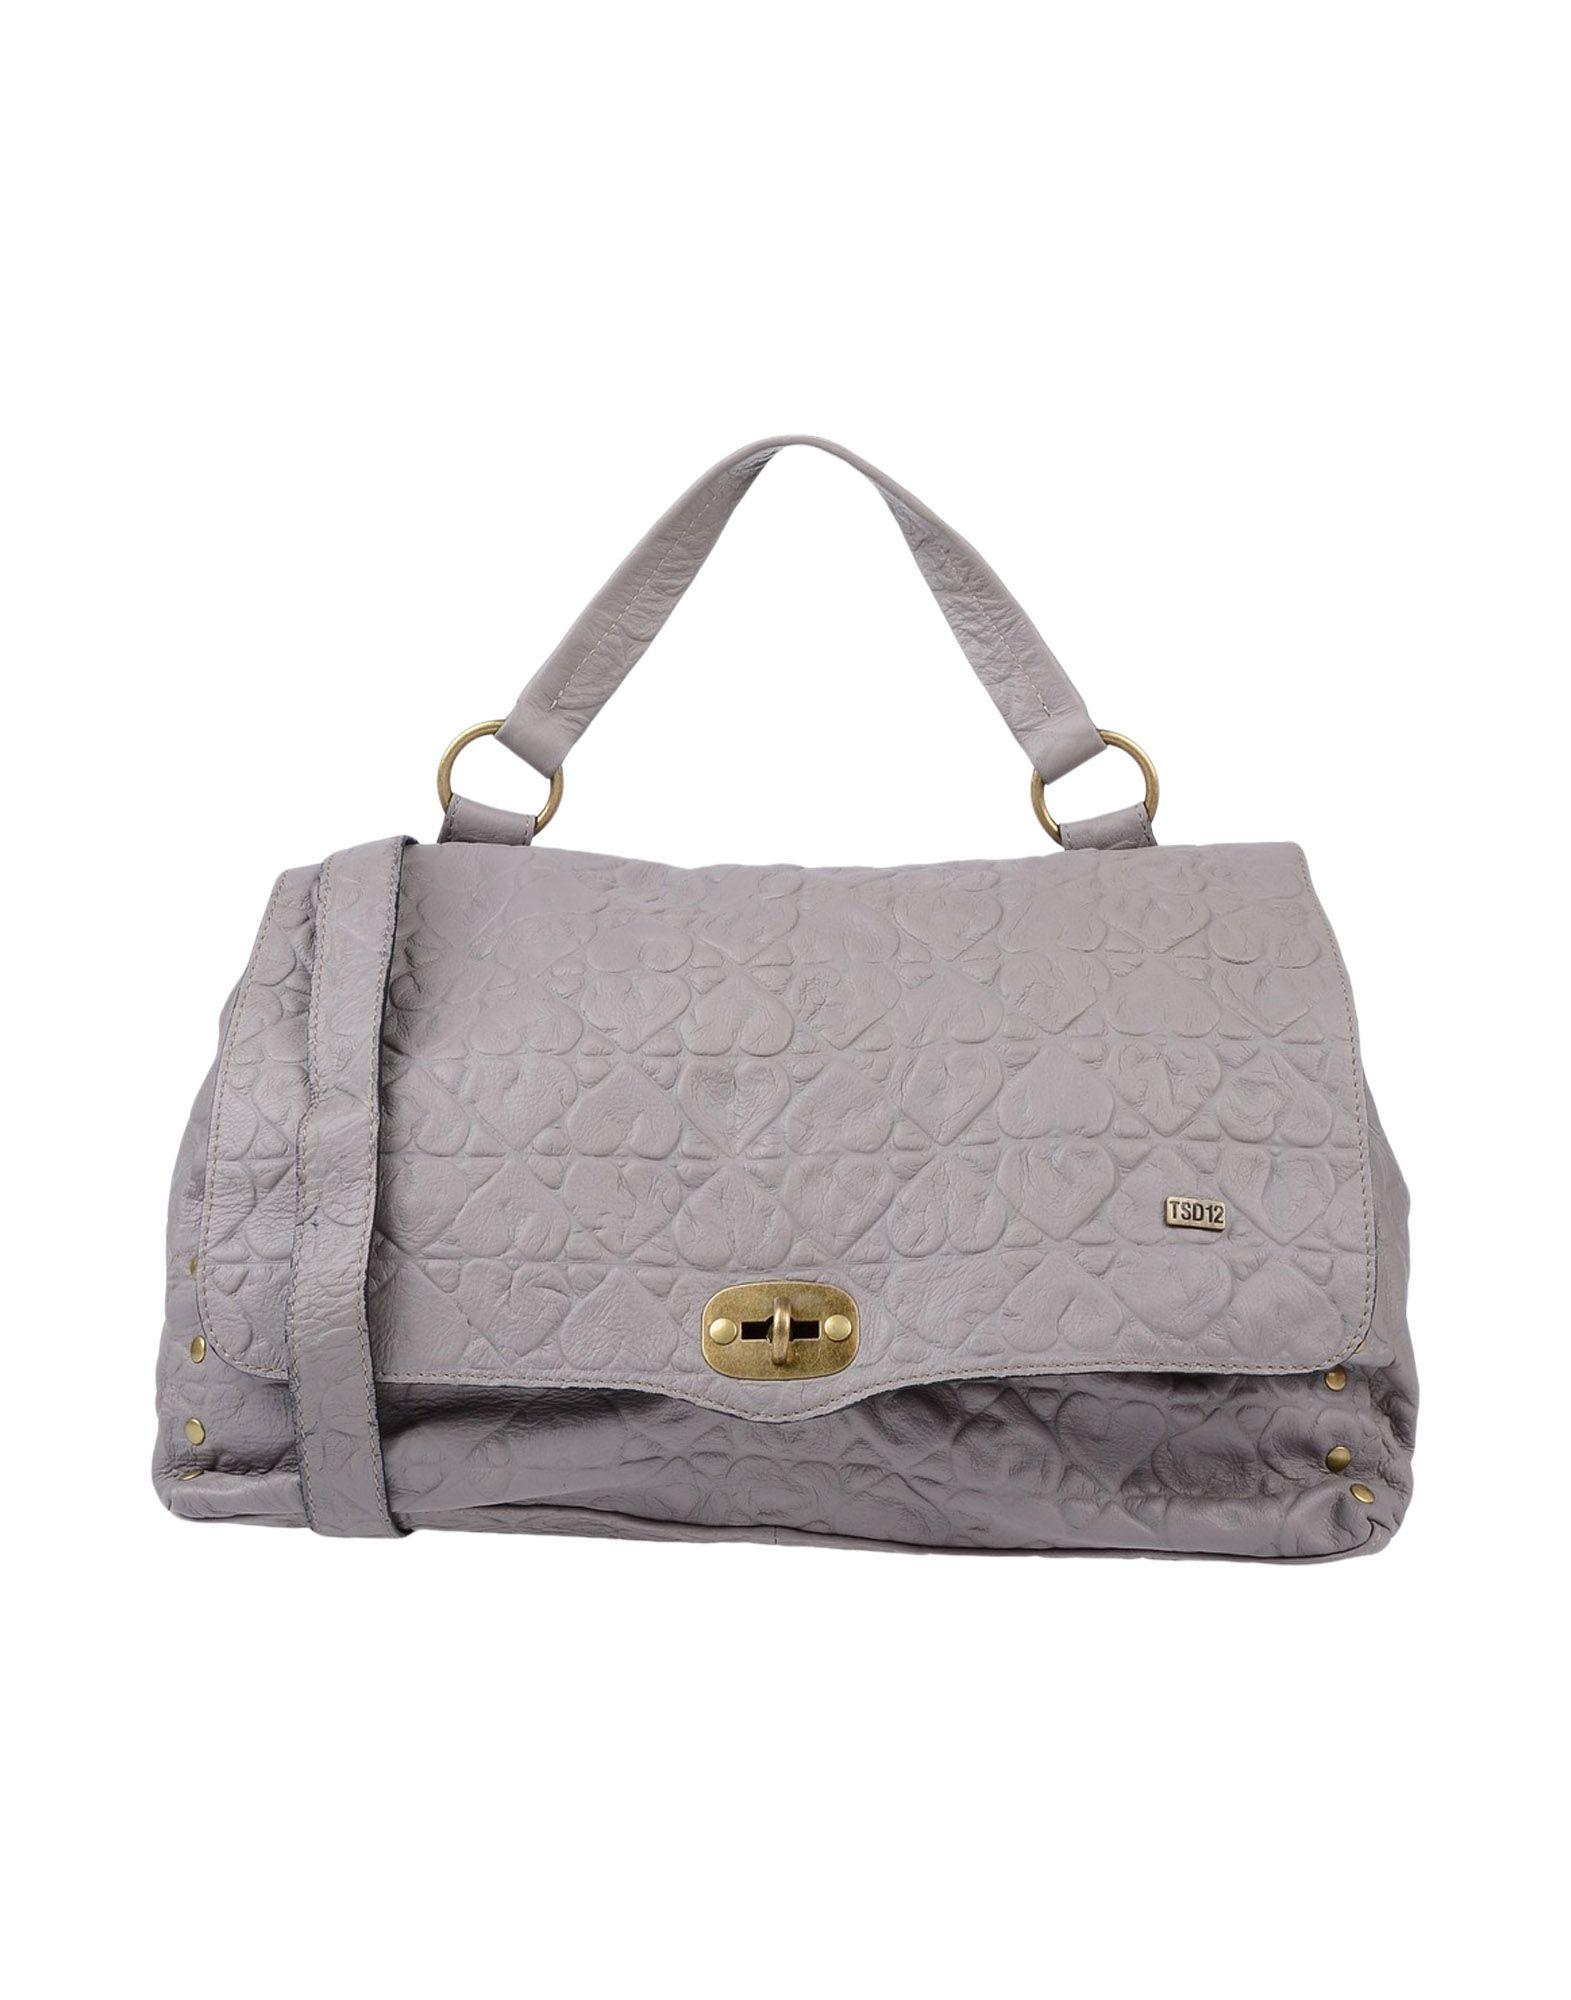 Tsd12 Women Kong Hong On Handbags Handbag Online Yoox r5wqrA